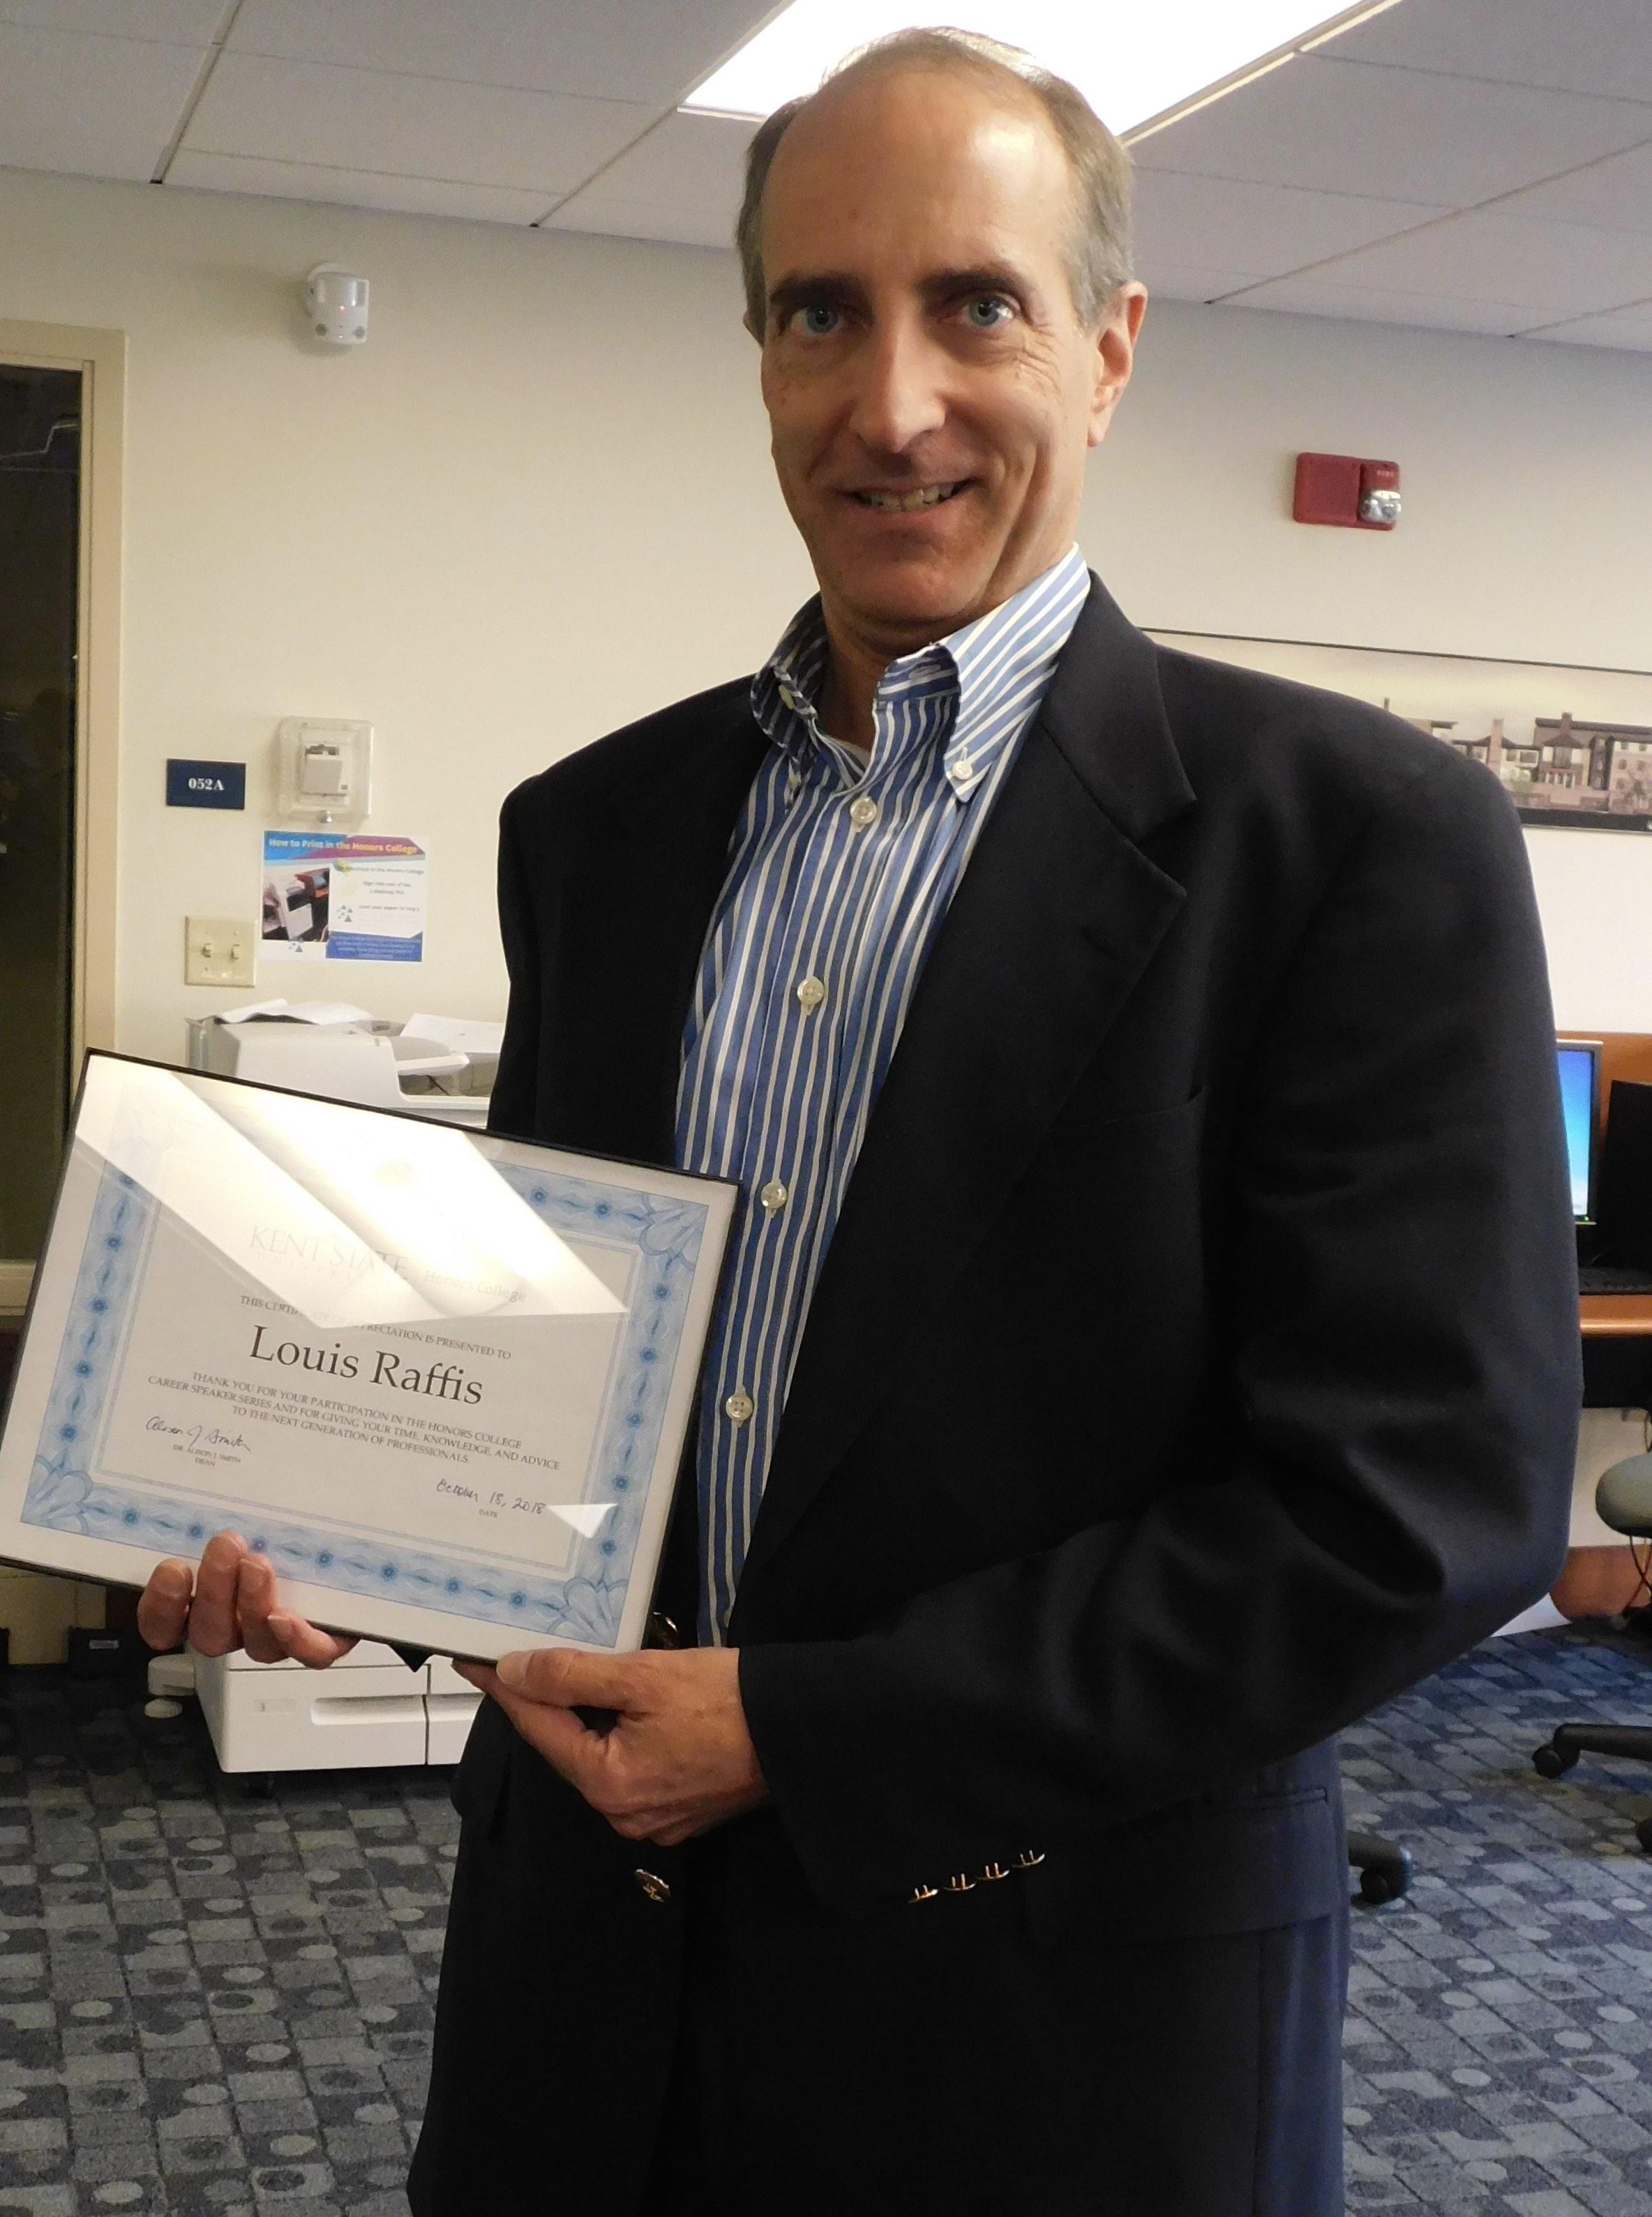 Lou Raffis, recipient of the 2020 Distinguished Honors Alumni Award